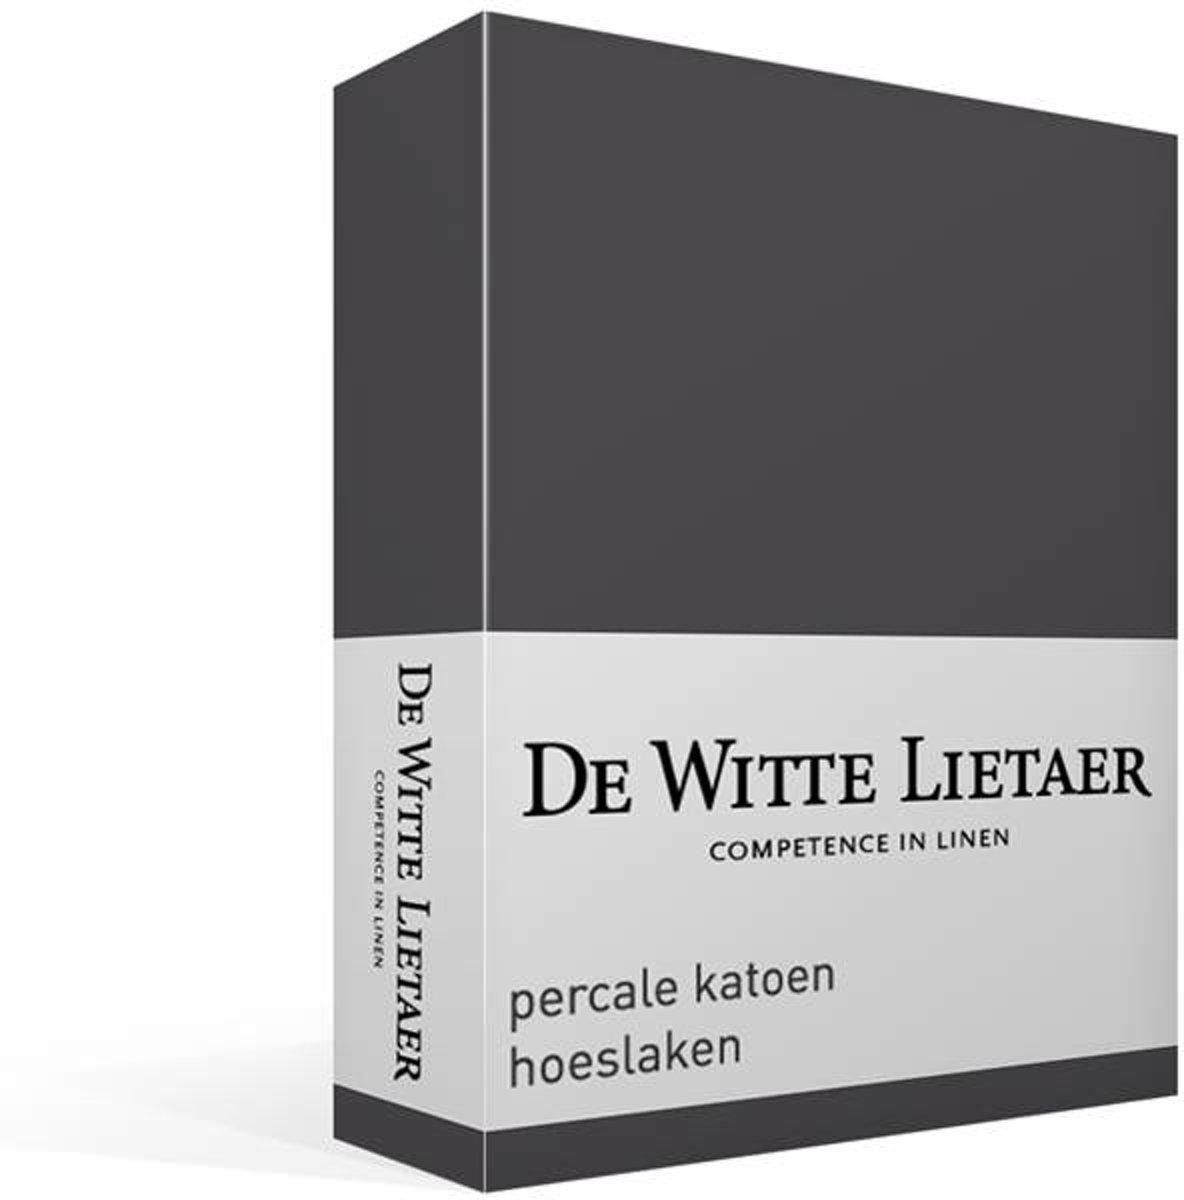 De Witte Lietaer percale katoen hoeslaken - 100% percale katoen - Lits-jumeaux (200x200 cm) - Grijs